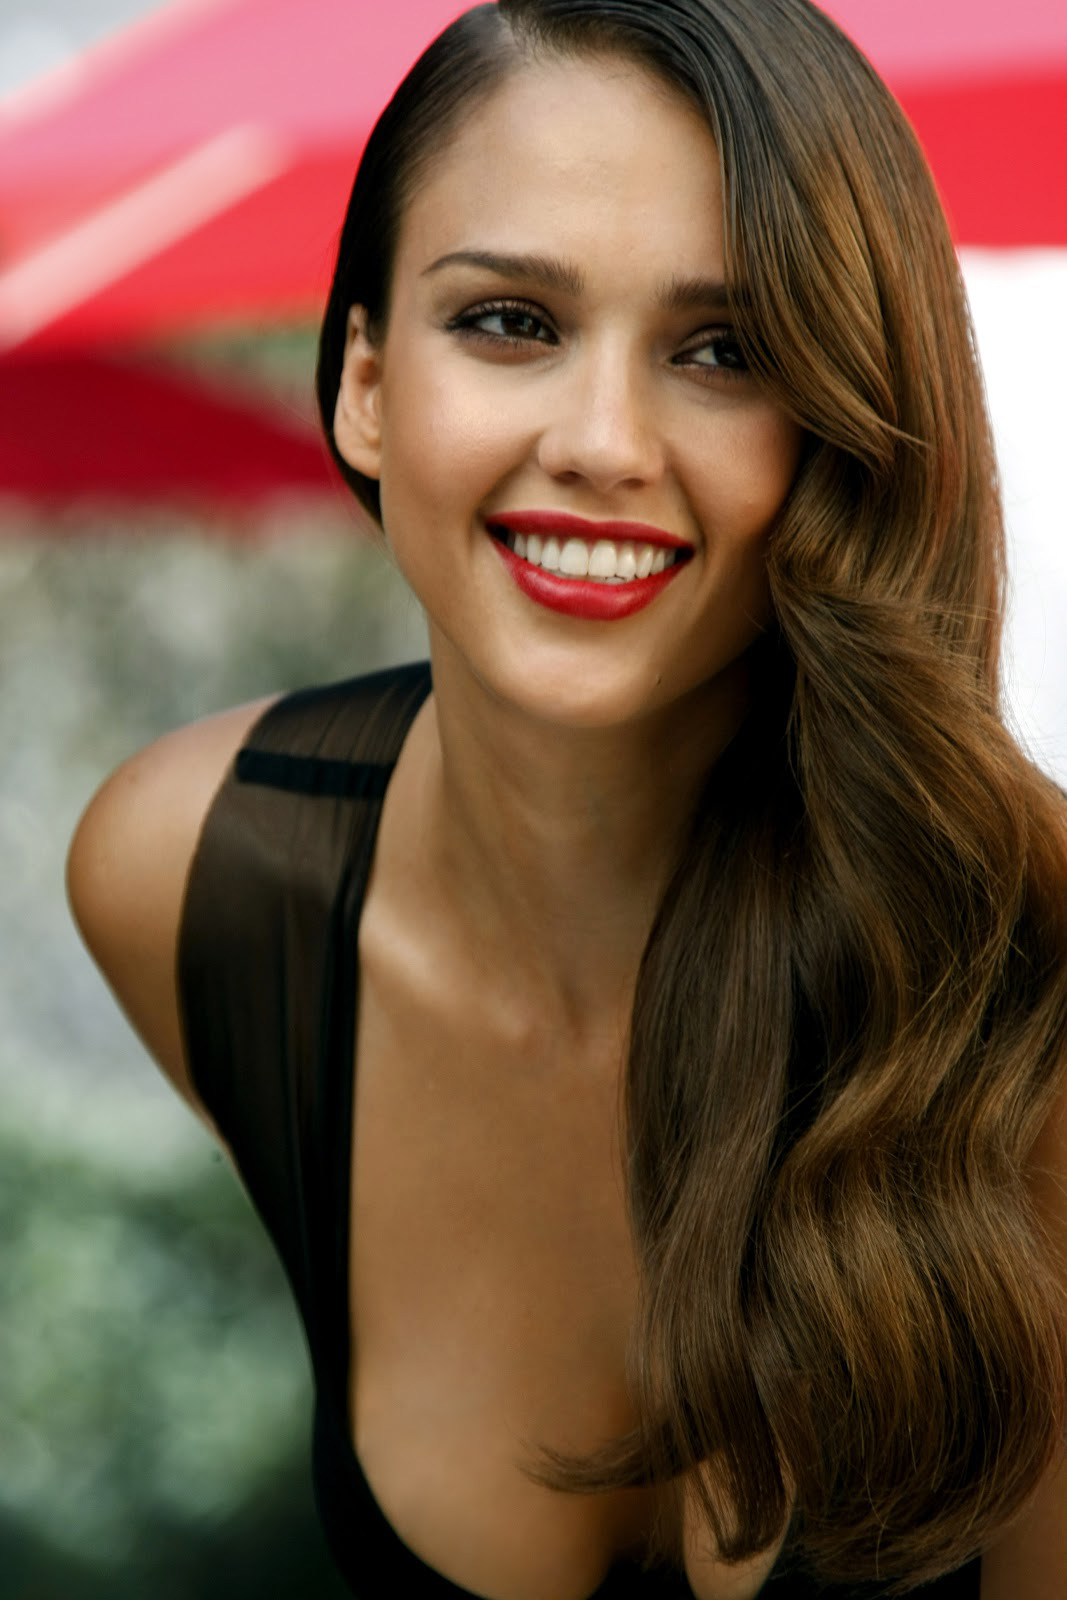 Pelle Olivastra Il Make Up Giusto Glamourit